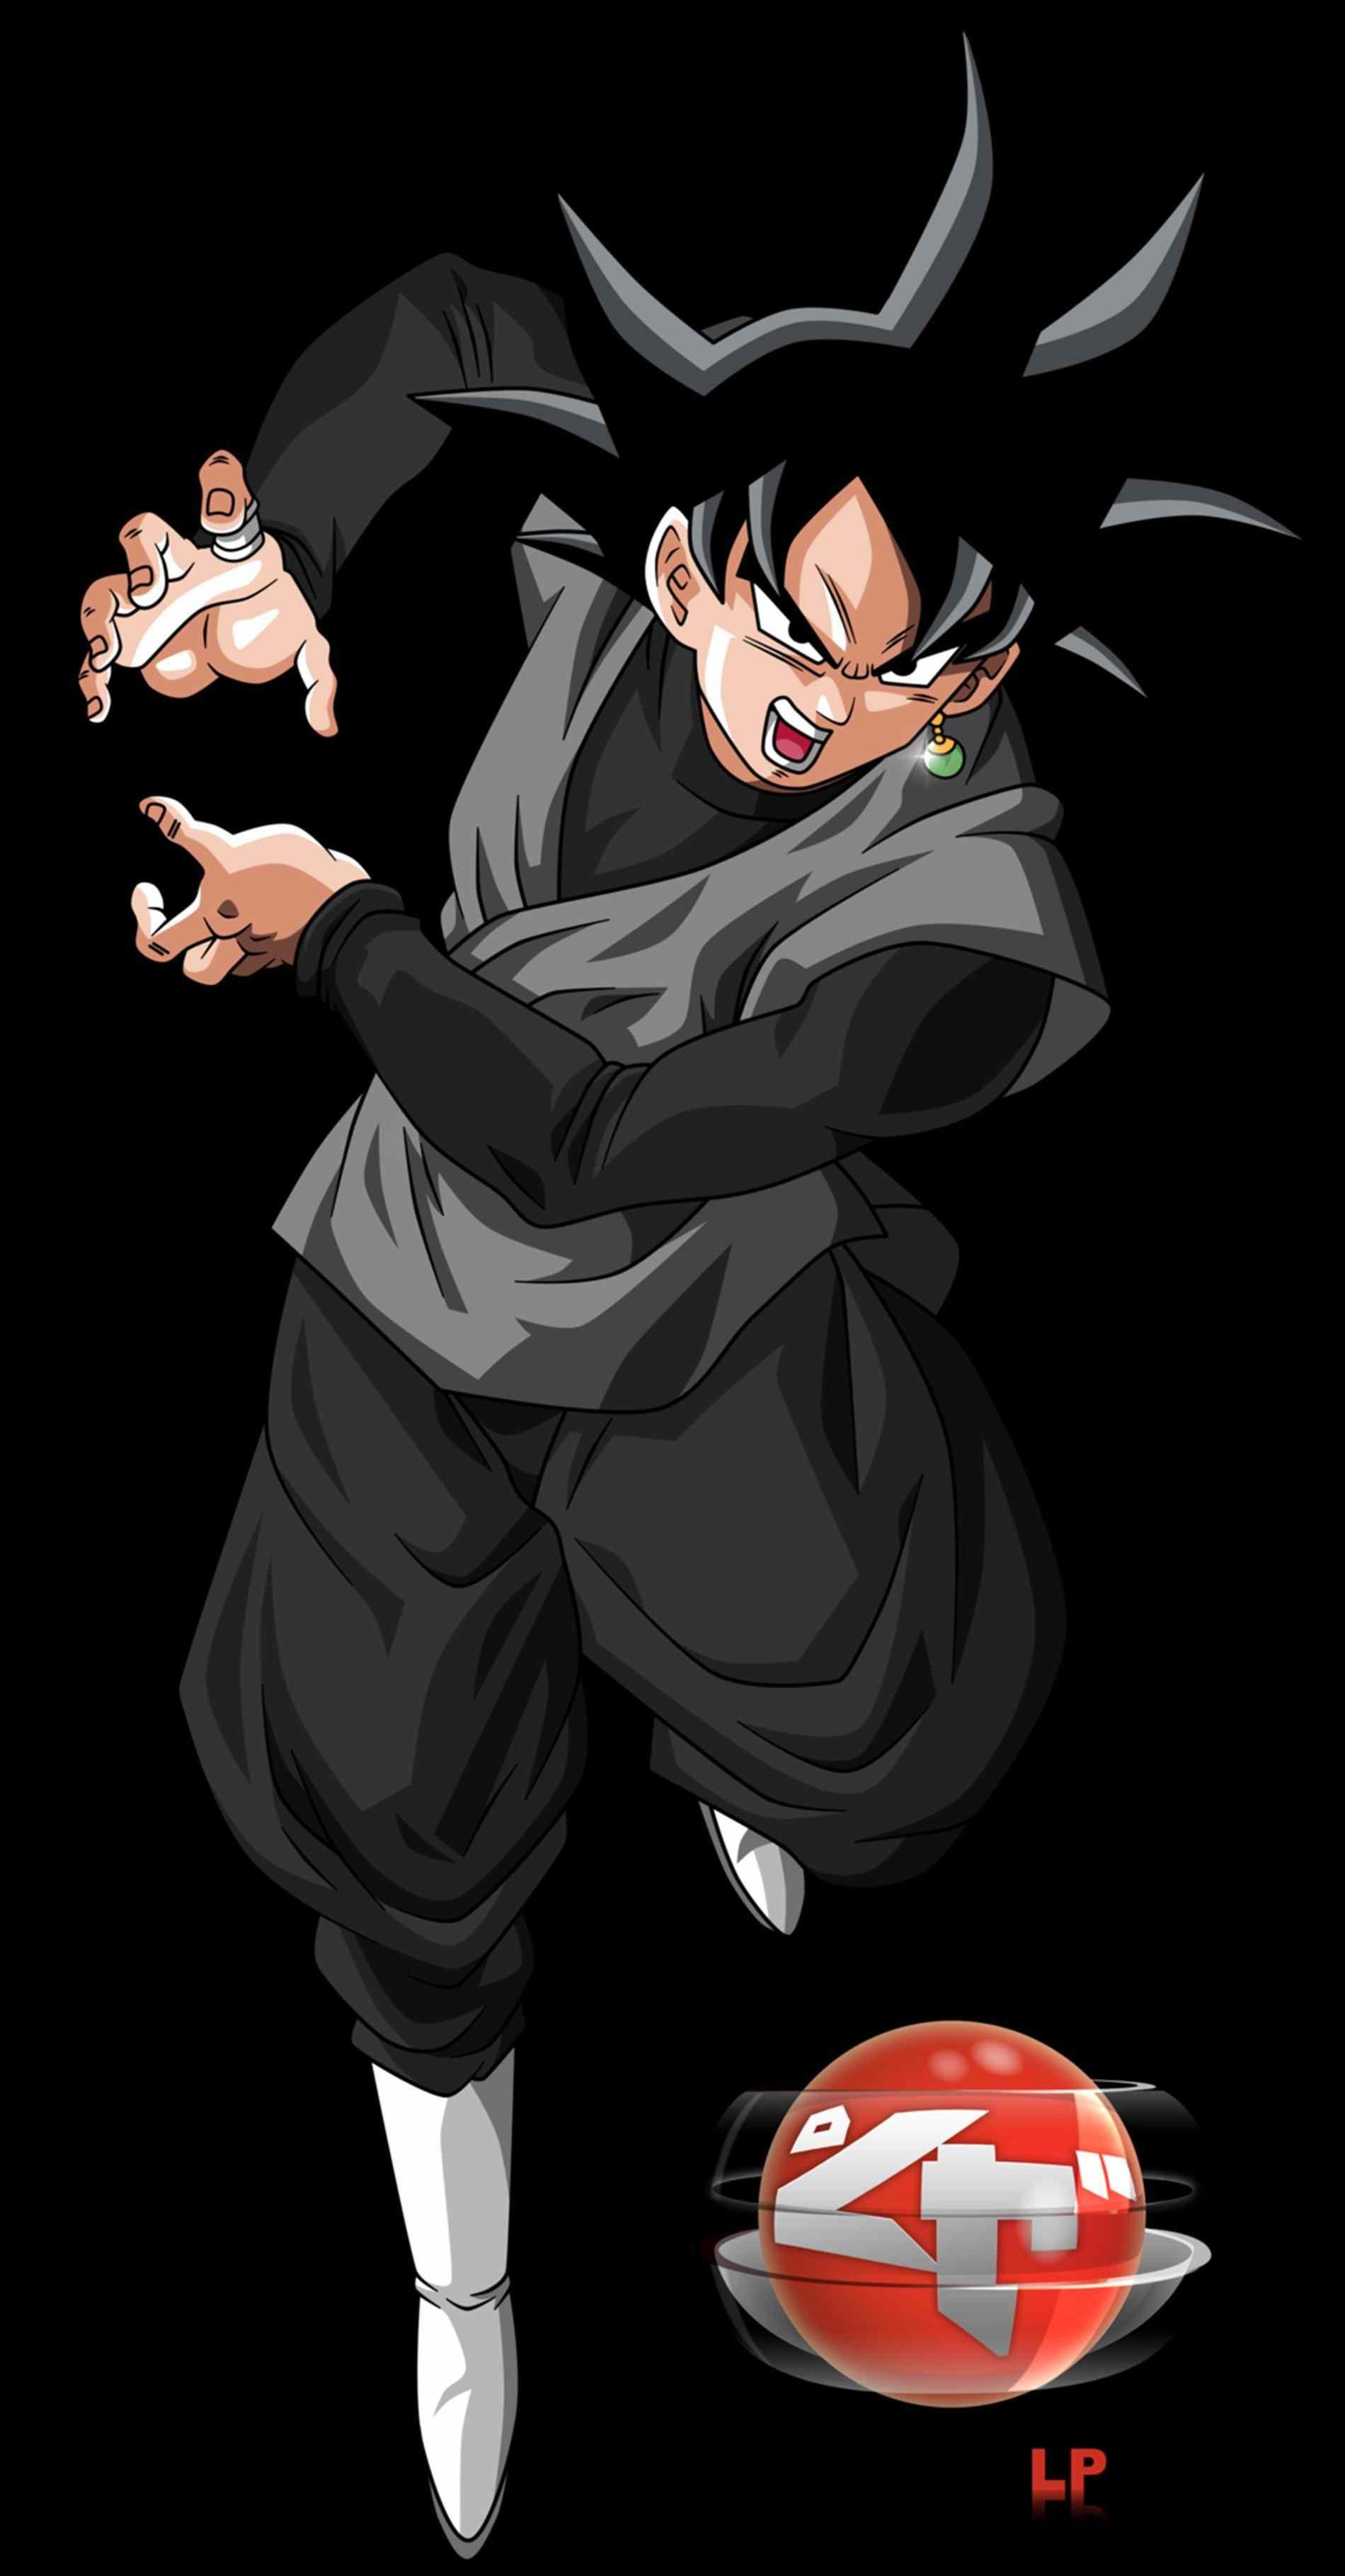 Dragon Ball Z Goku Black 1900x3638 Wallpaper Teahub Io